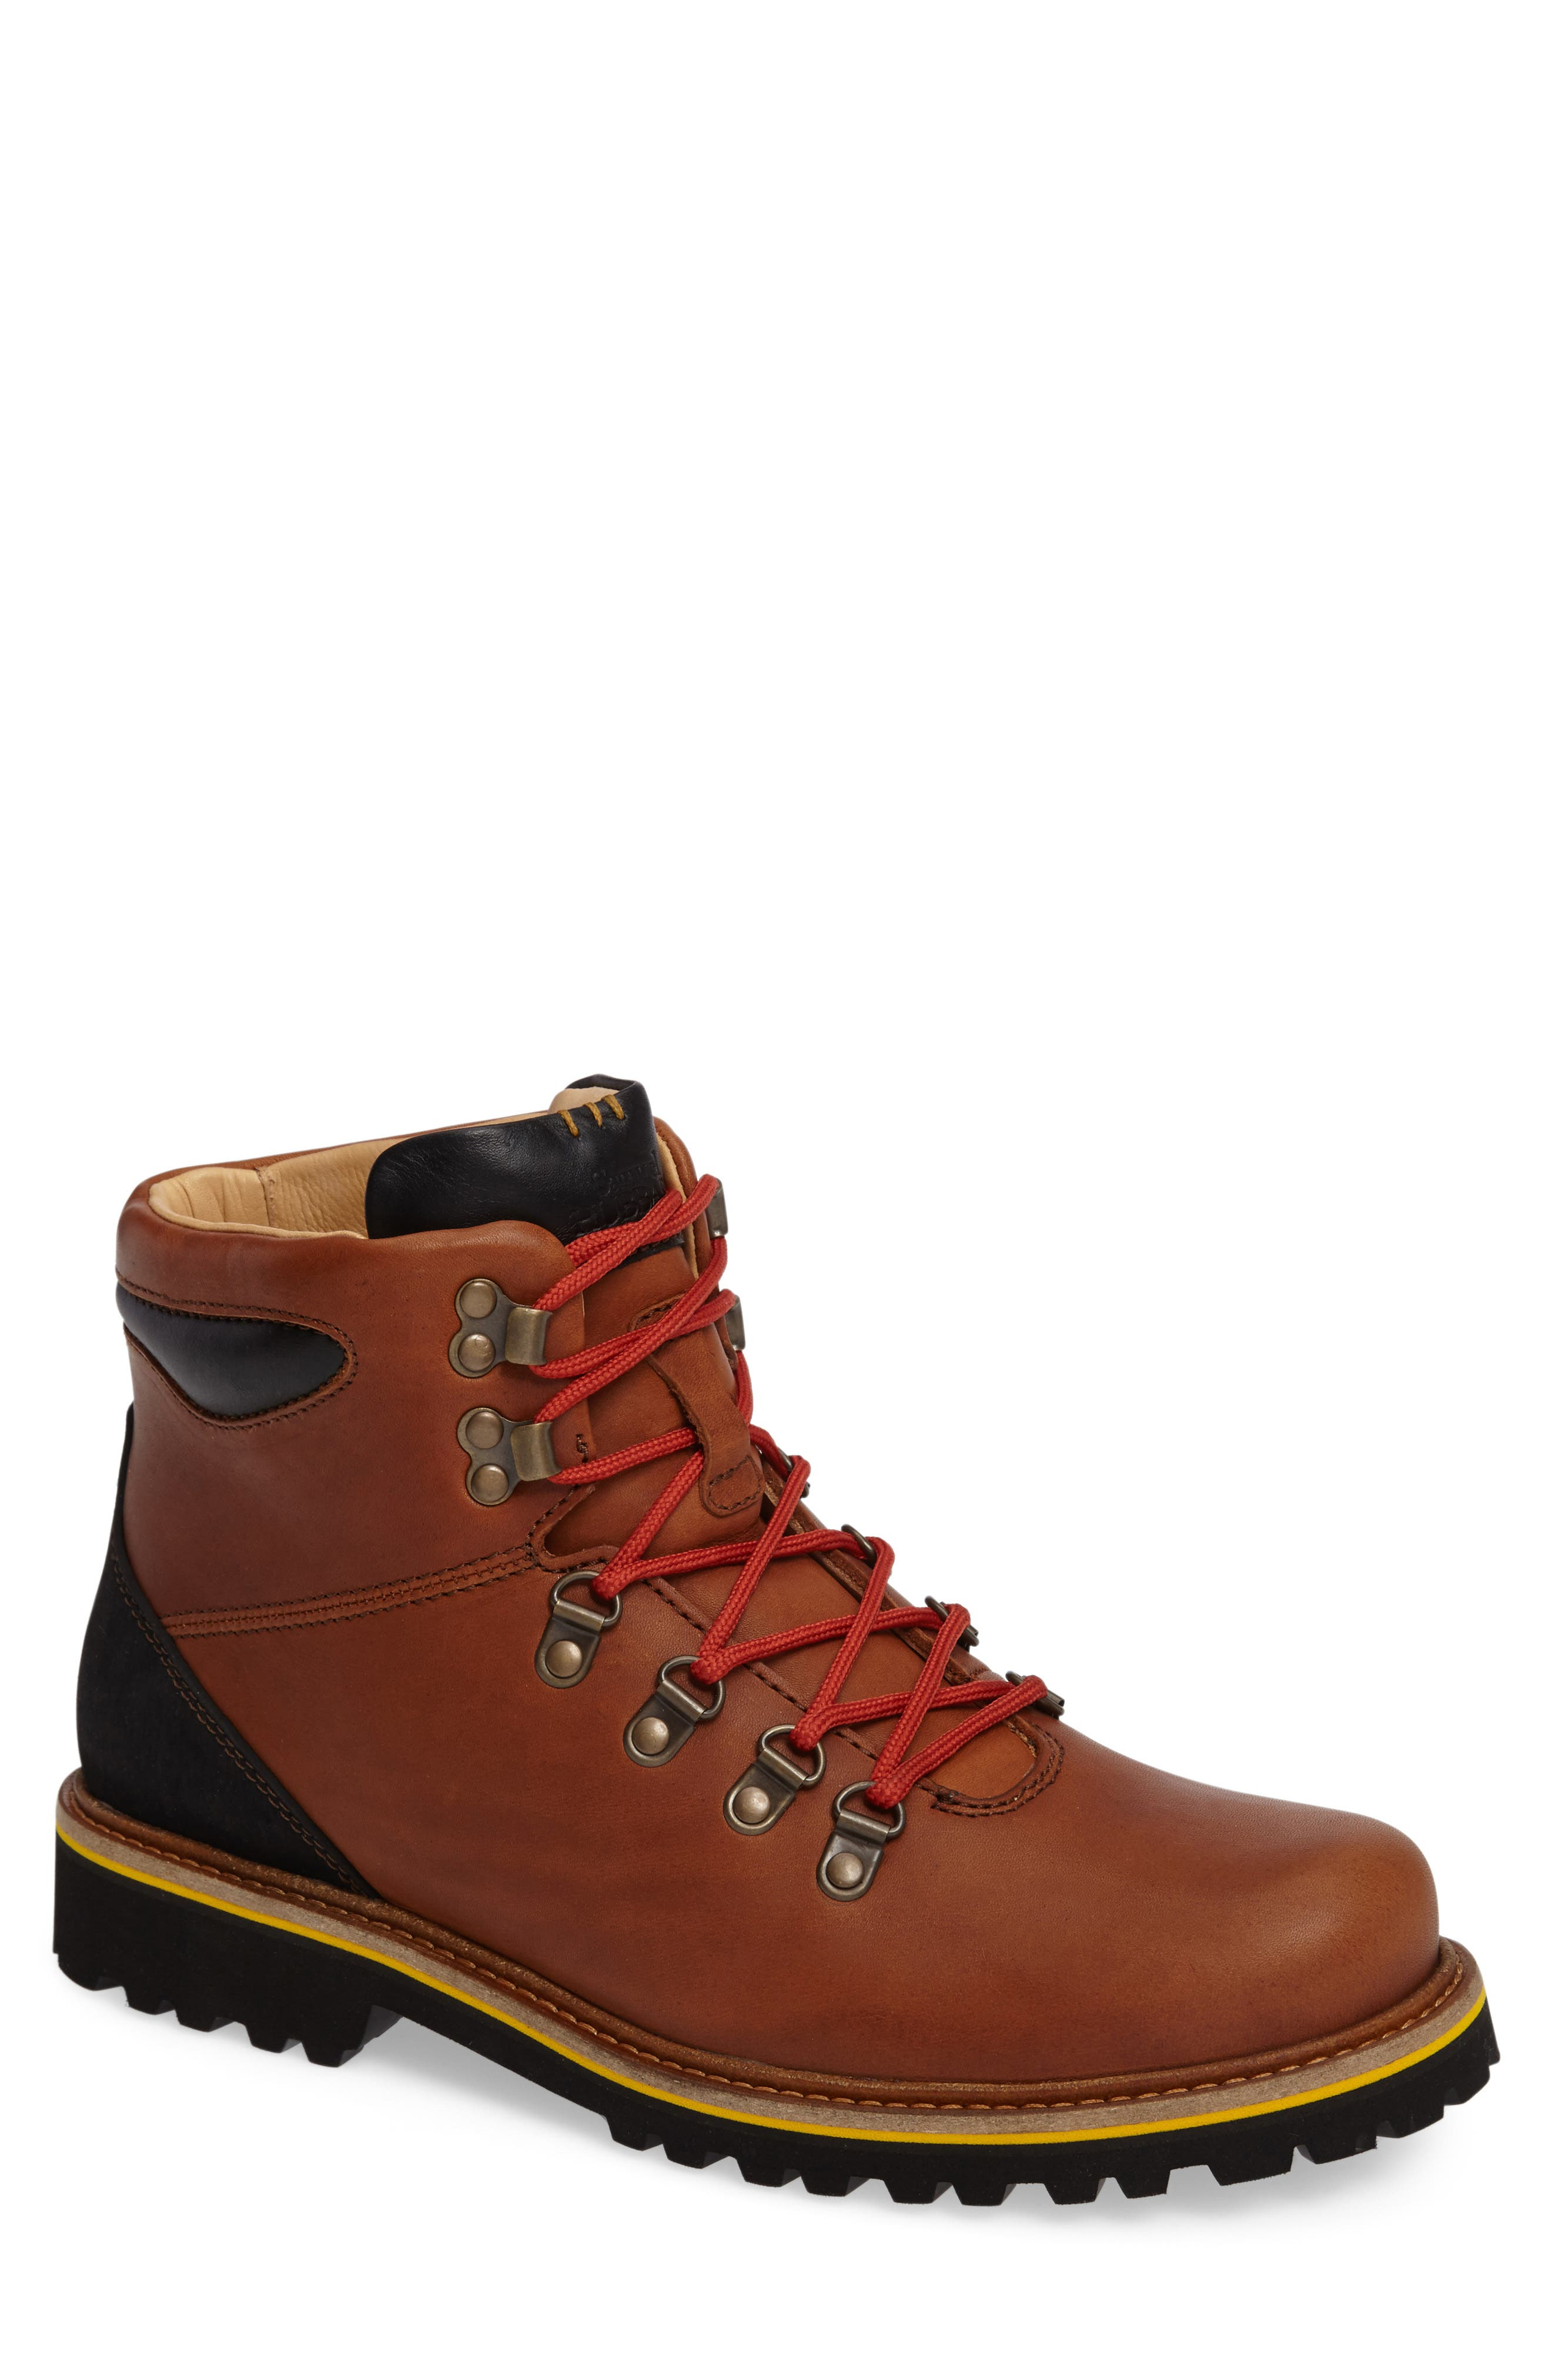 Mt. Tam Hiking Boot,                         Main,                         color, SADDLEBAG TAN LEATHER